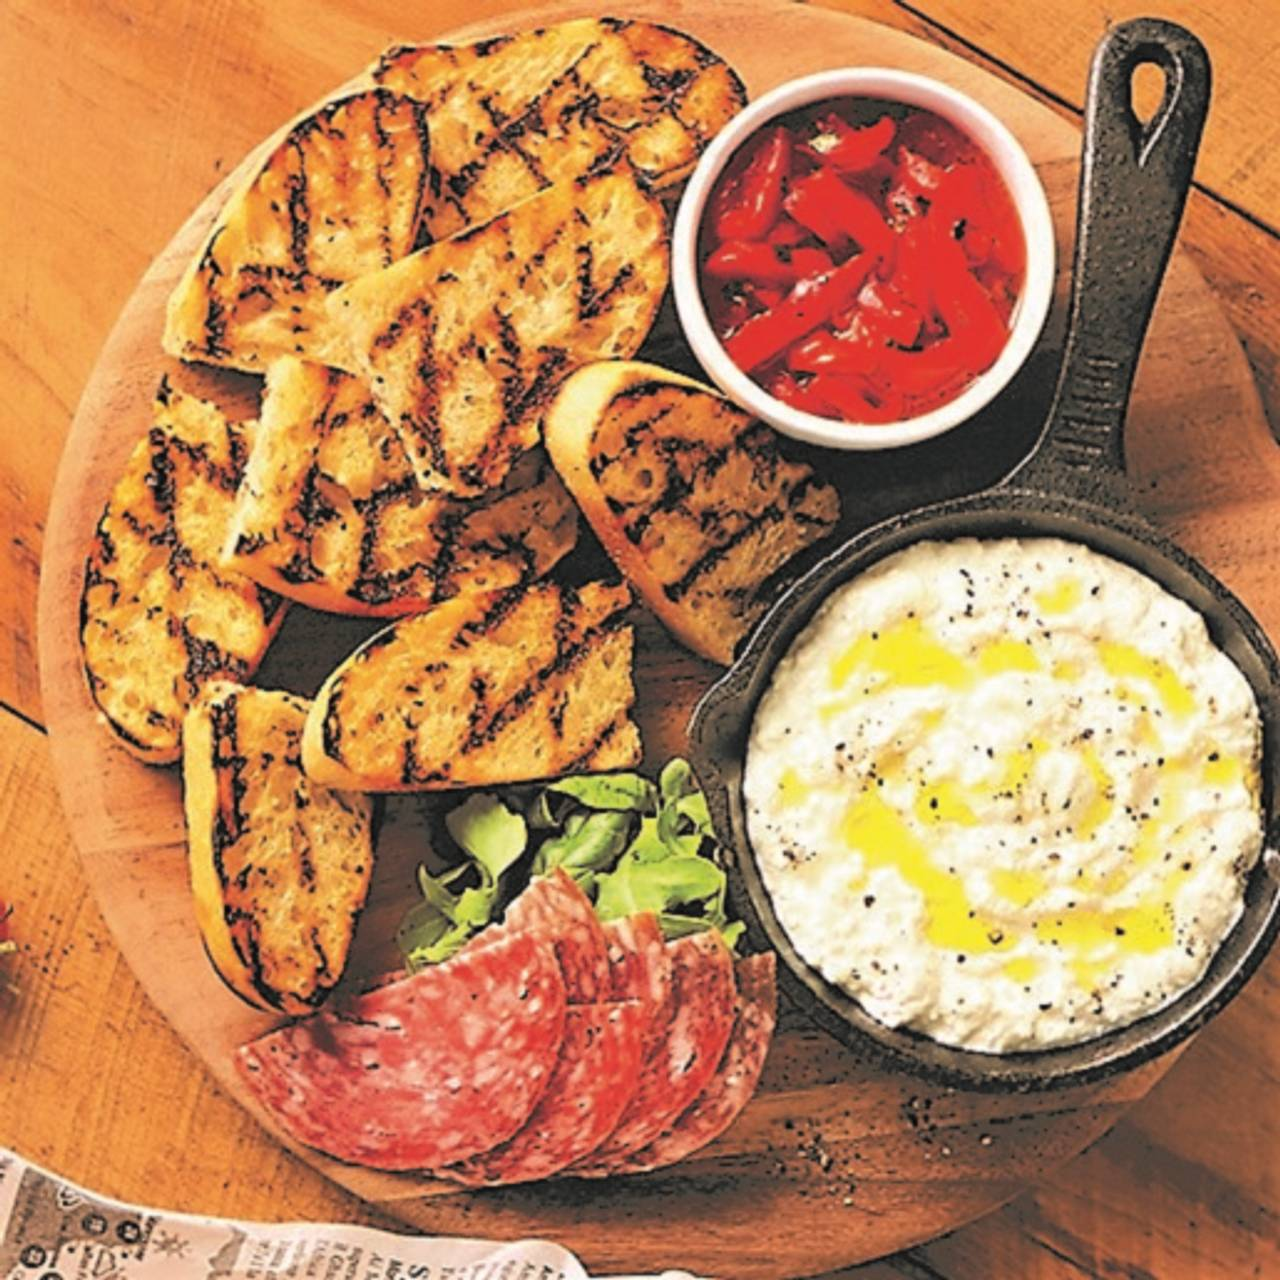 Bravo Cucina Italiana Whitehall Lehigh Valley Restaurant